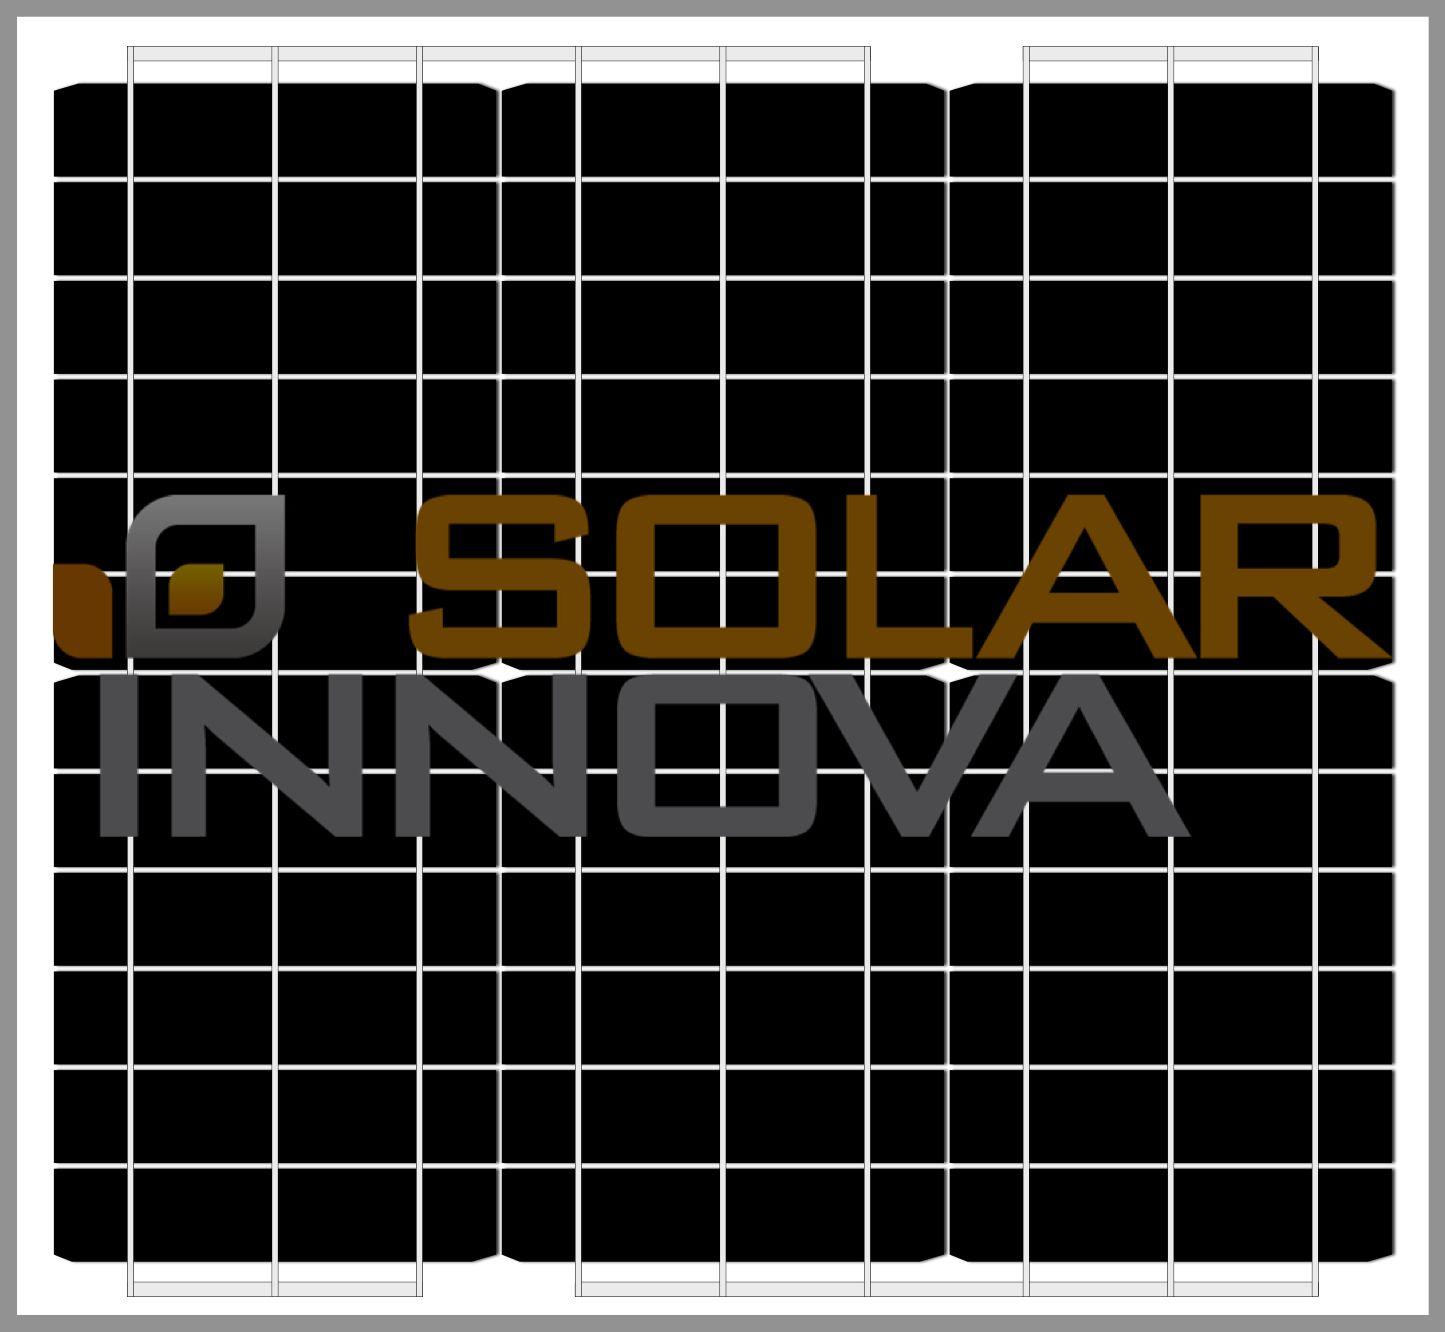 Monocrystalline Solar Panel 30 Wp #solarinnova #solar #energy #solarenergy #renewableenergy #photovoltaic #solarpower #solarpv #pvpanel #pvpanels #solarpanels #solarmodules #pvmodule #pvmodules #monocrystalline #electricity #cleanenergy #greenenergy #energia #energiasolar #energiarenovable #fotovoltaica #panelsolar #panelessolares #panelesfotovoltaicos #modulosfotovoltaicos #monocristalinos #electricidad